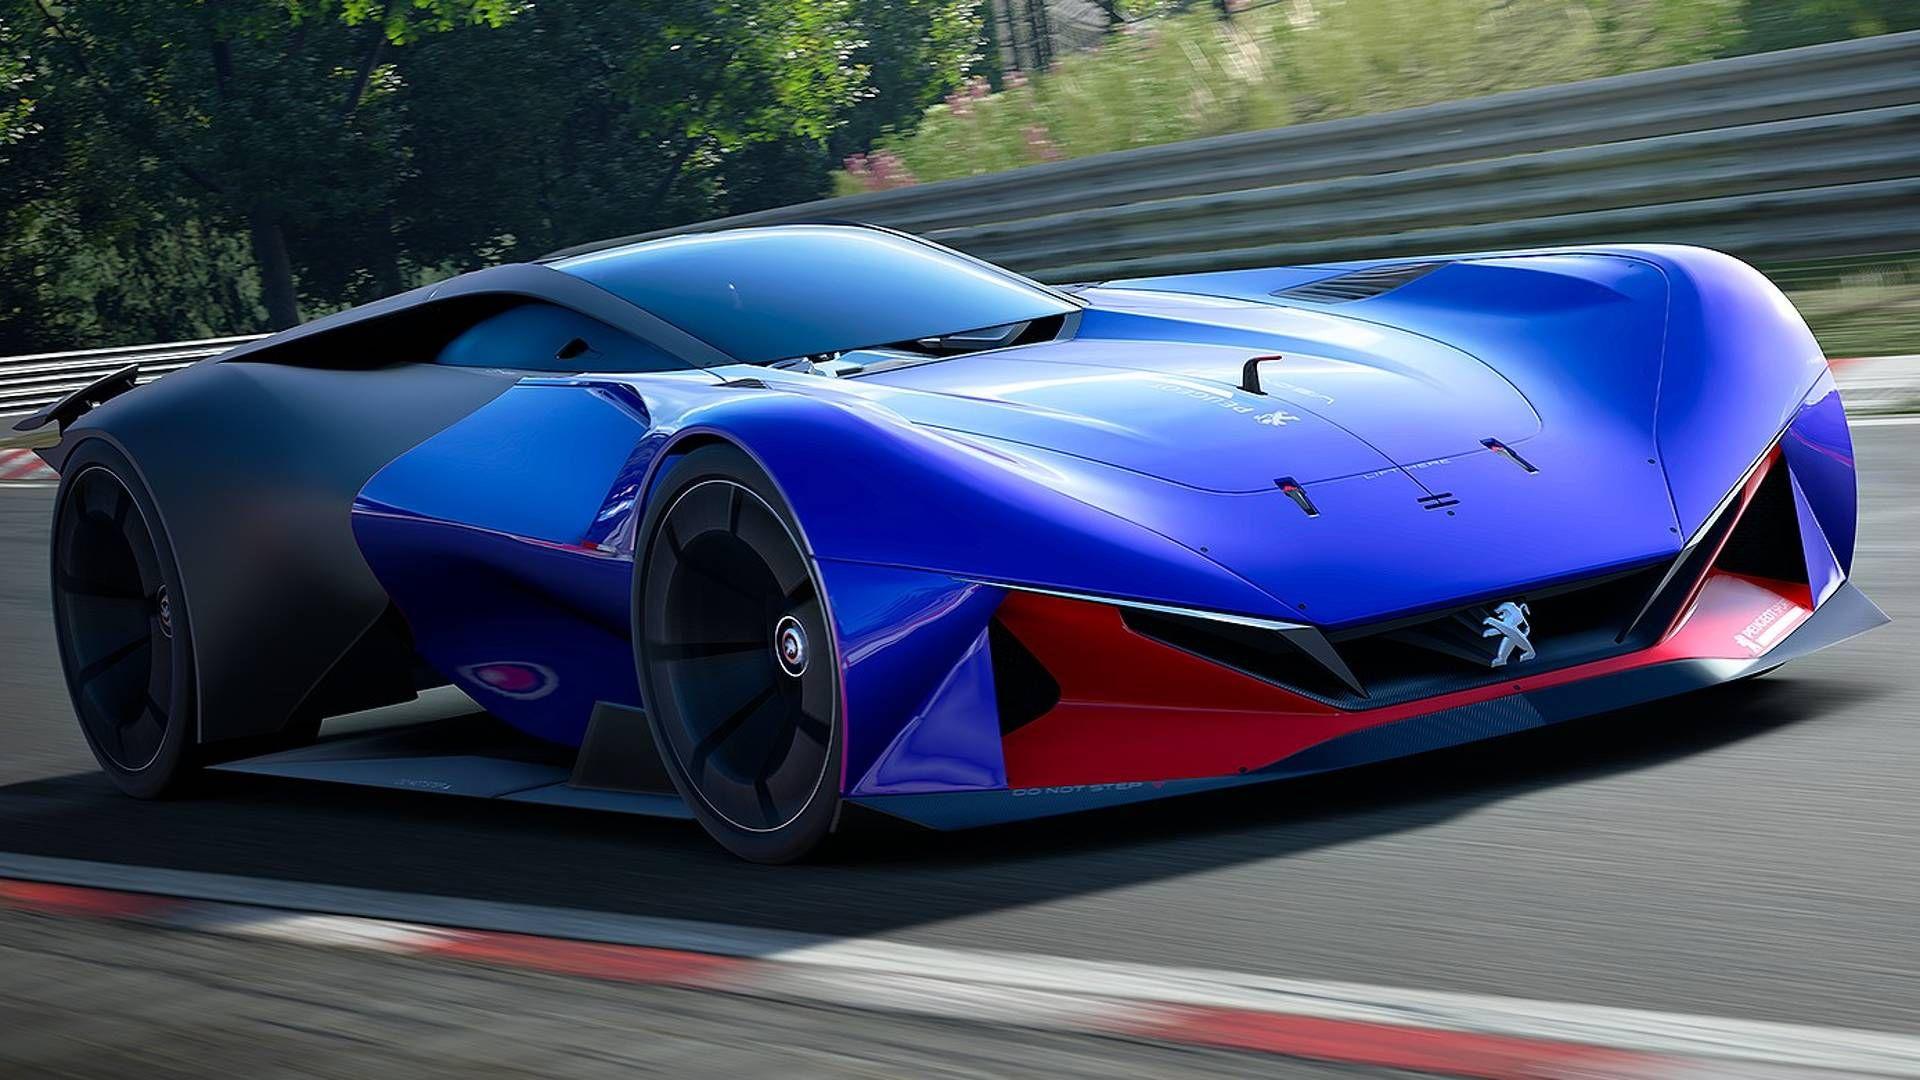 Peugeot L750 R Hybrid Revs To 10 000 Rpm In Gran Turismo Sport